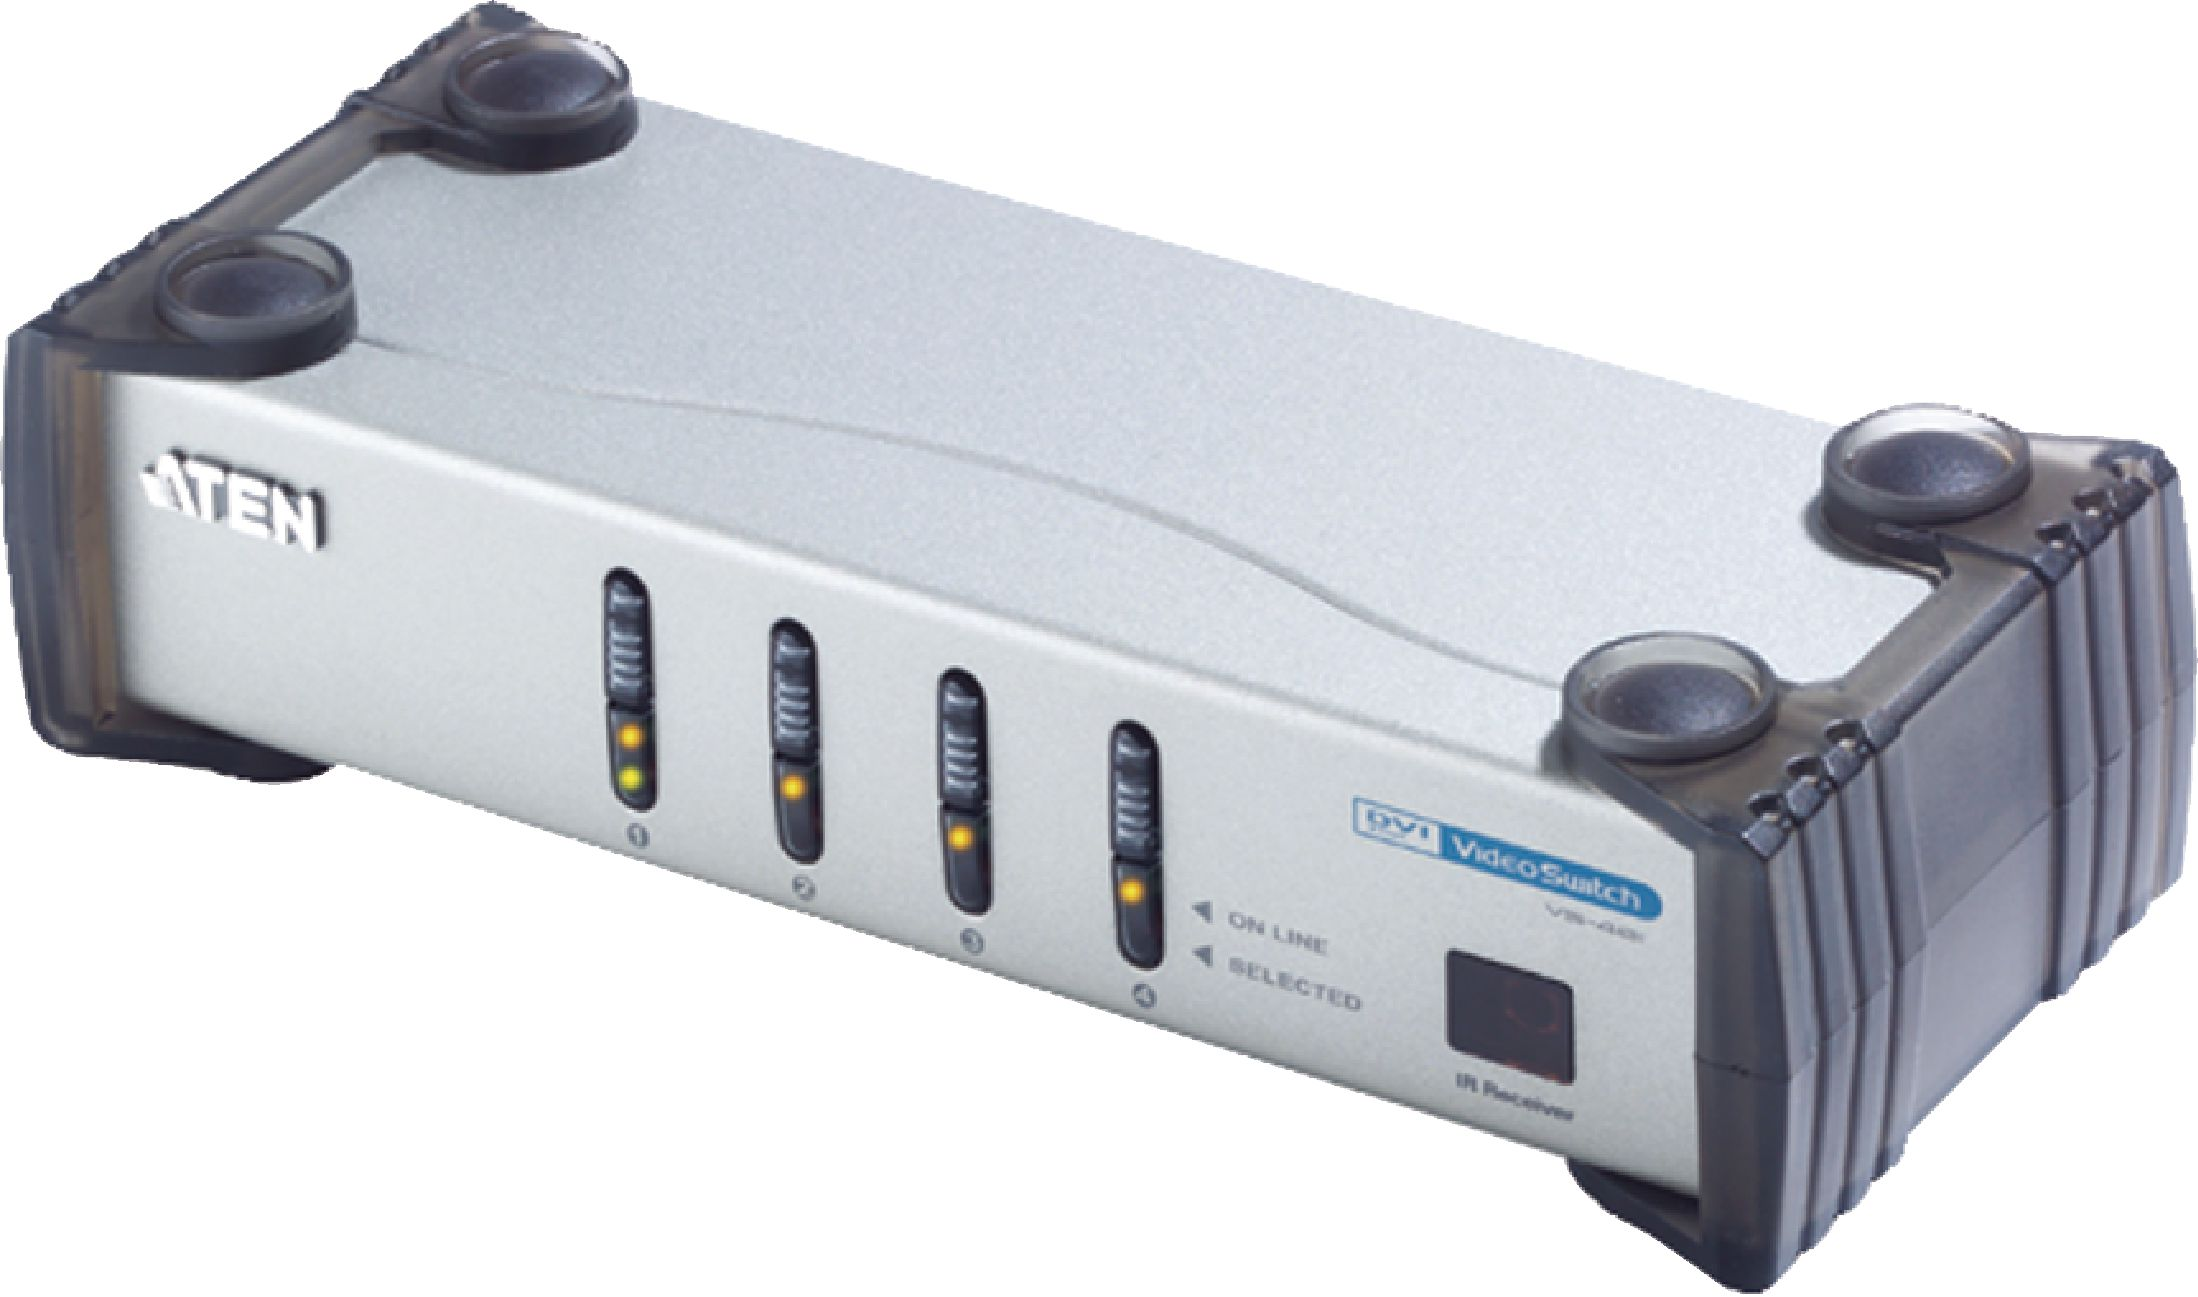 ATEN Video switch DVI-I, 4-port